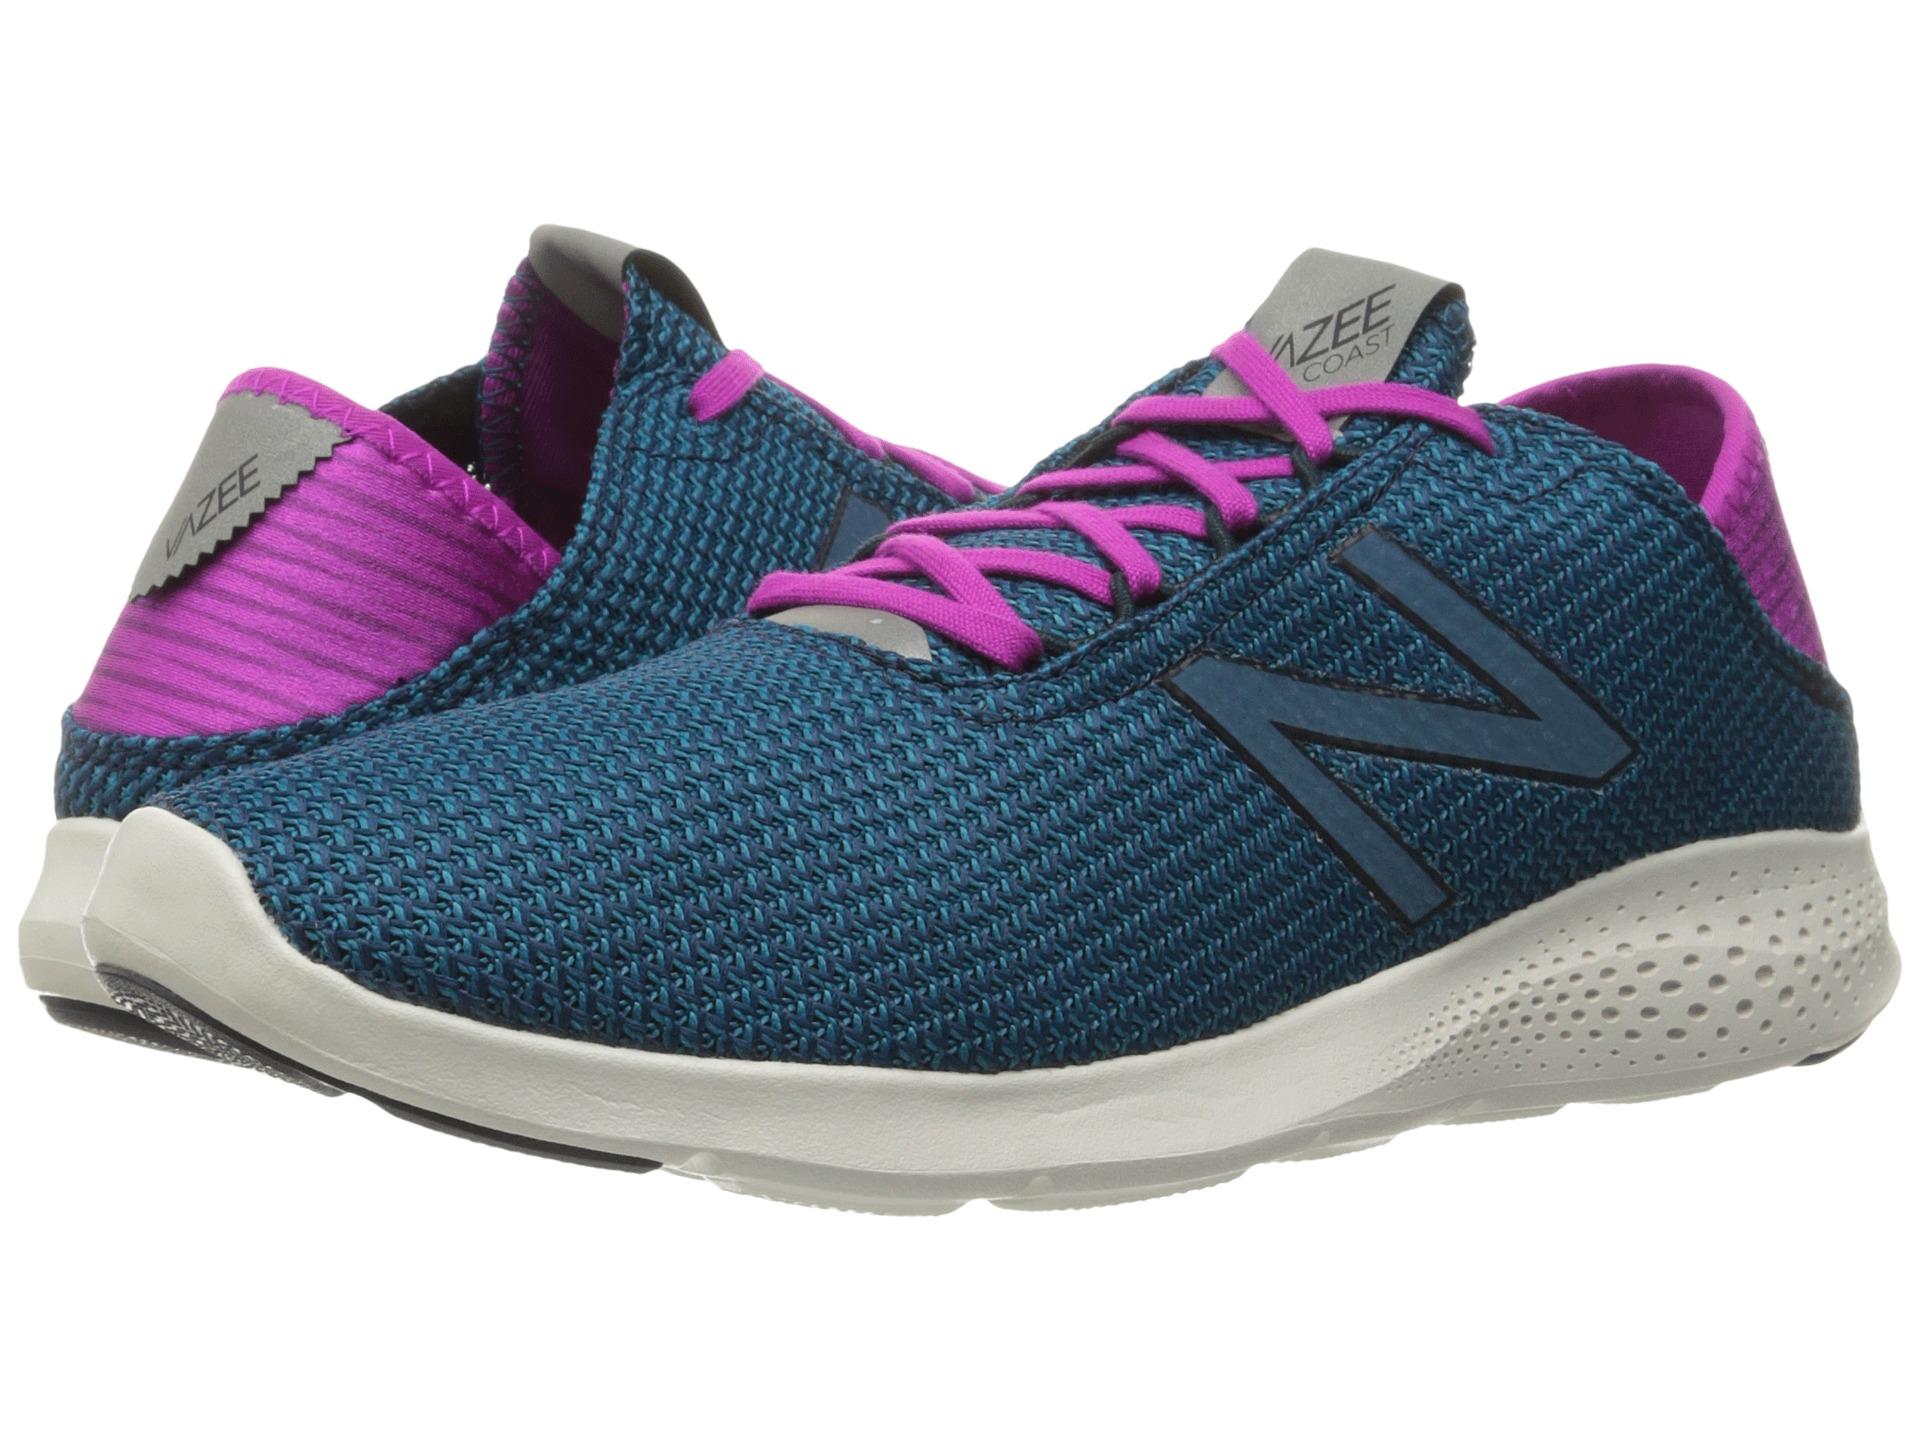 New Balance Coast Ladies Running Shoes